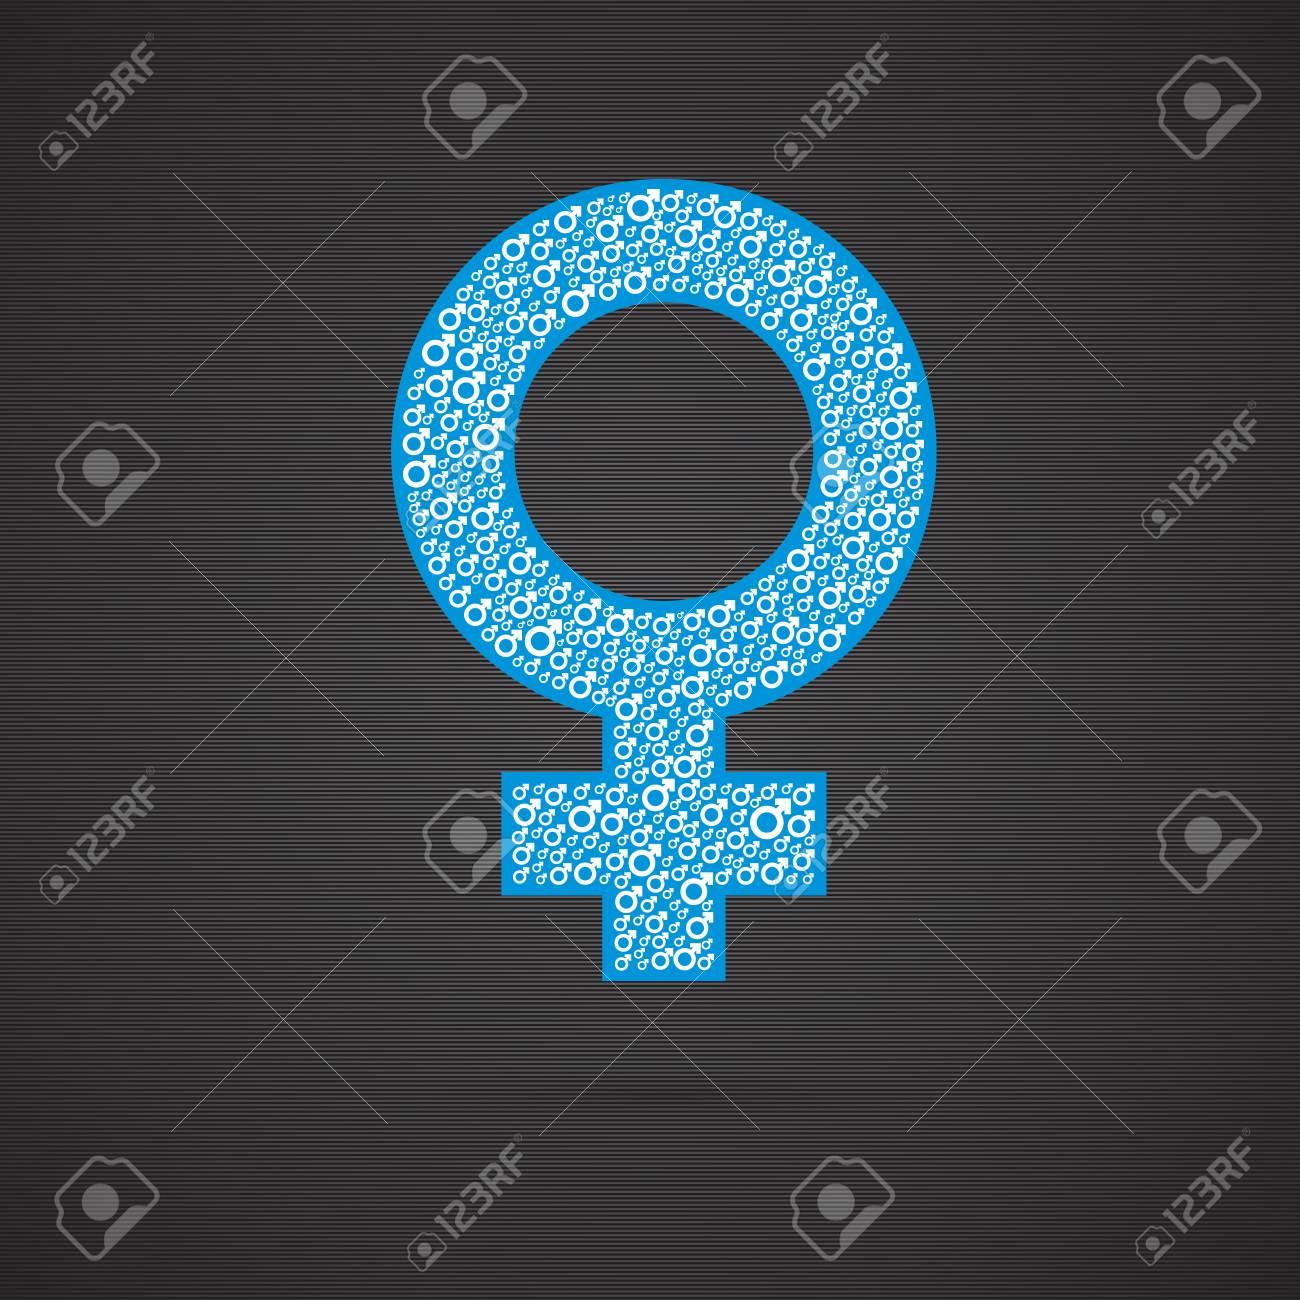 Homosexual Relationship Symbols Of Mars And Venus Representing